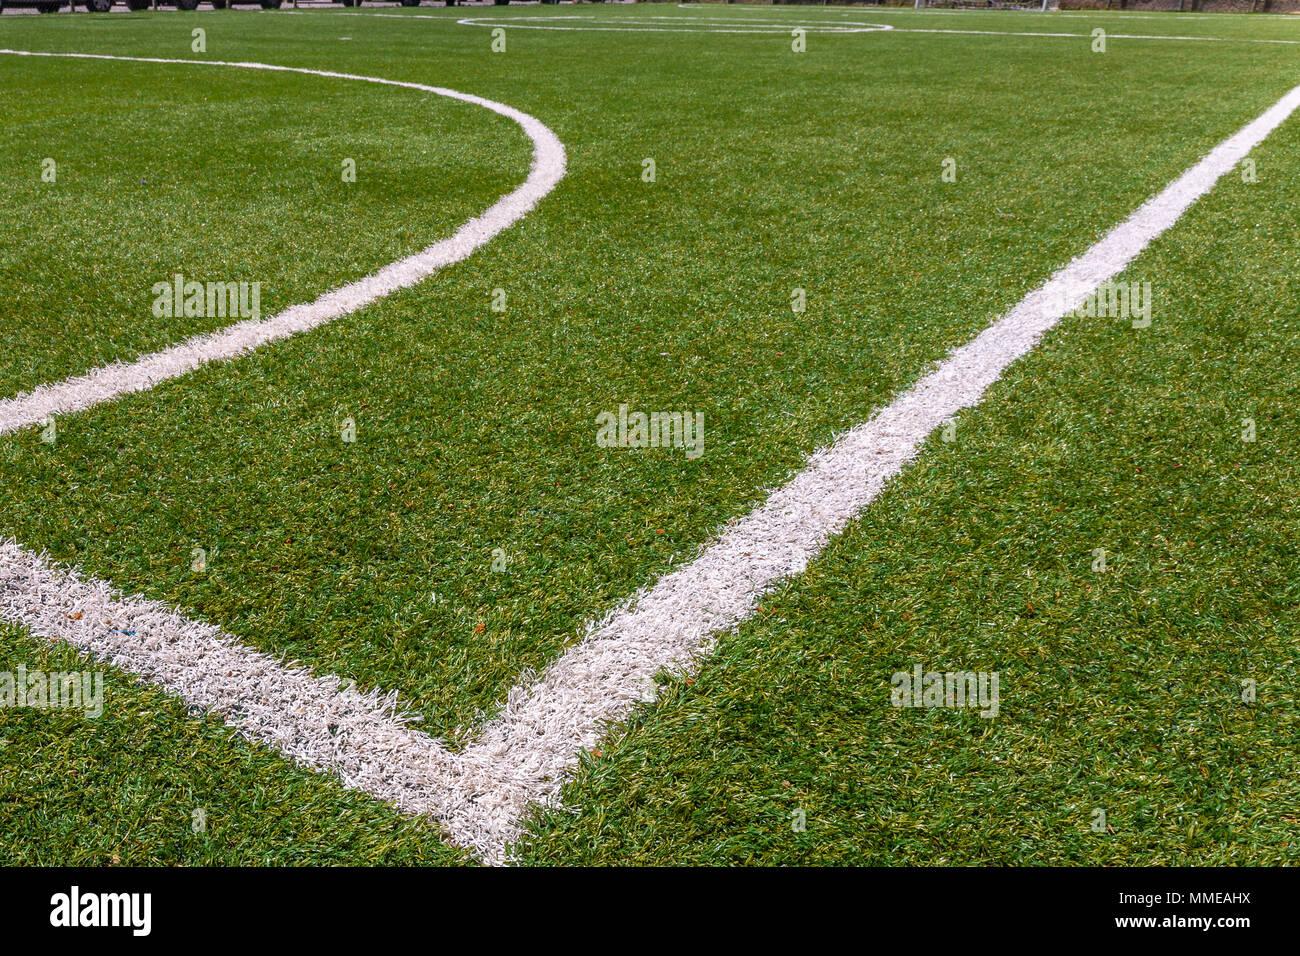 Football Pitch Texture Imágenes De Stock   Football Pitch Texture ... 436c36493f38a